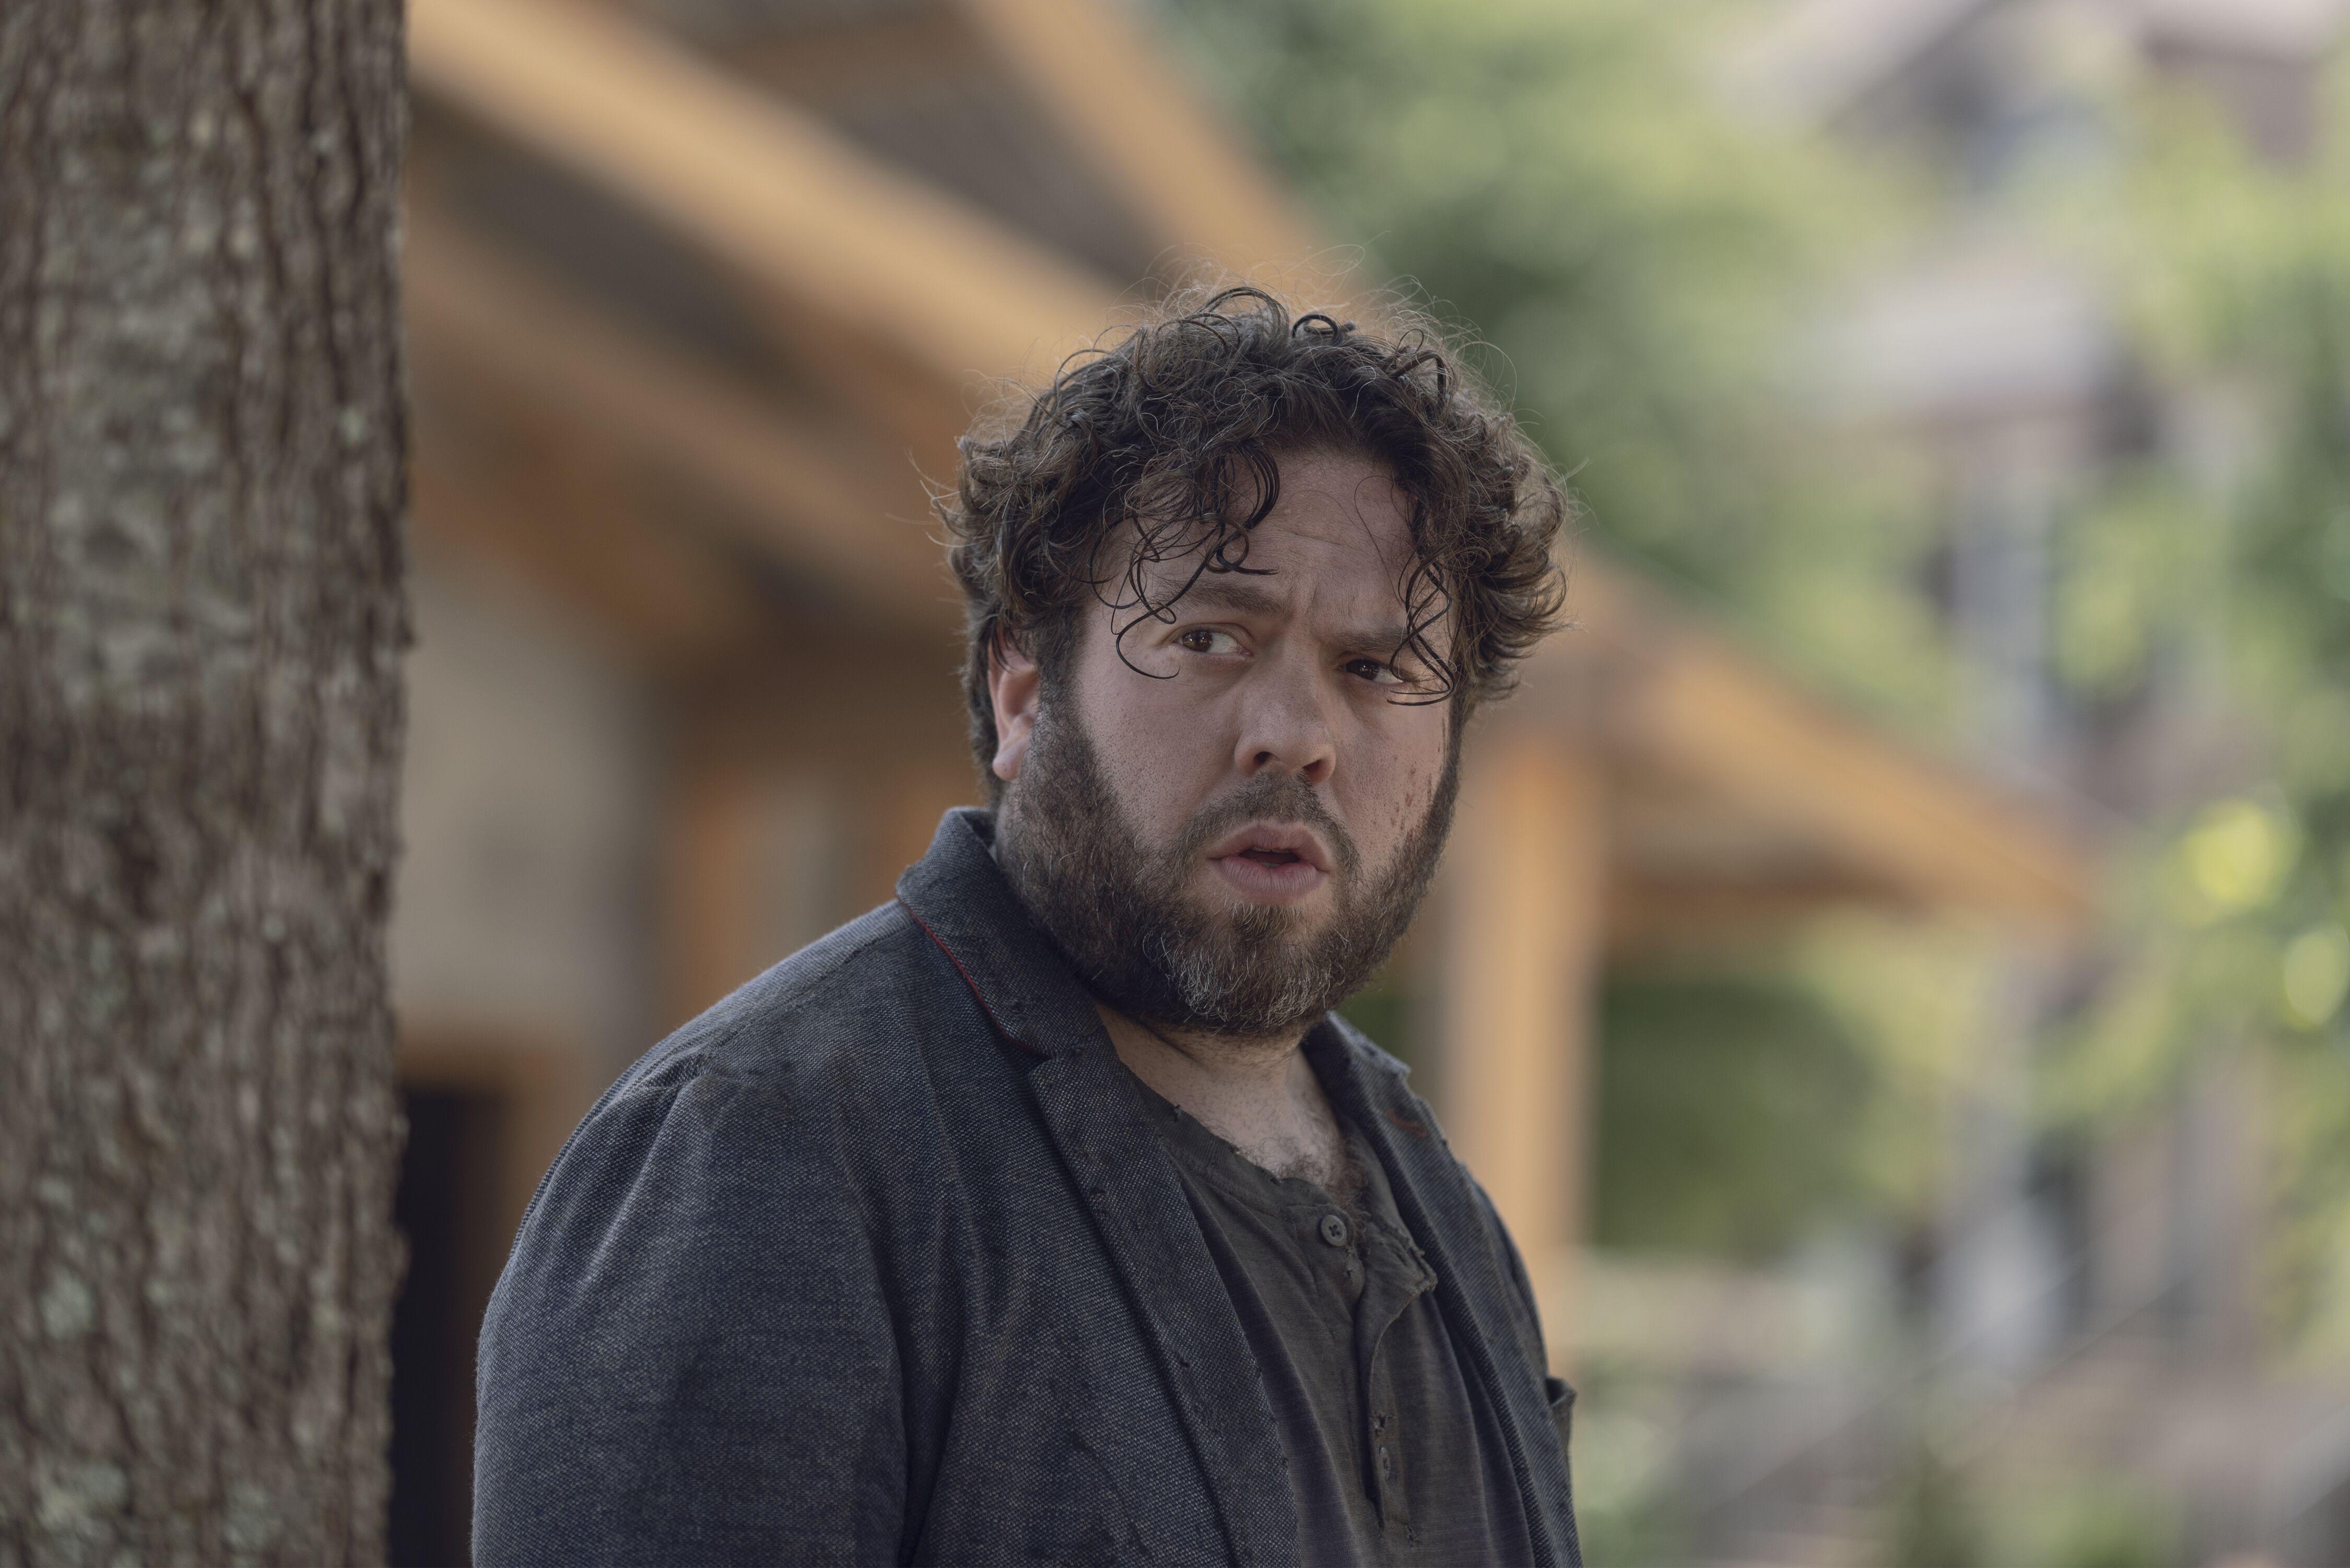 The Walking Dead season 9 episode 7 synopsis: Stradivarius